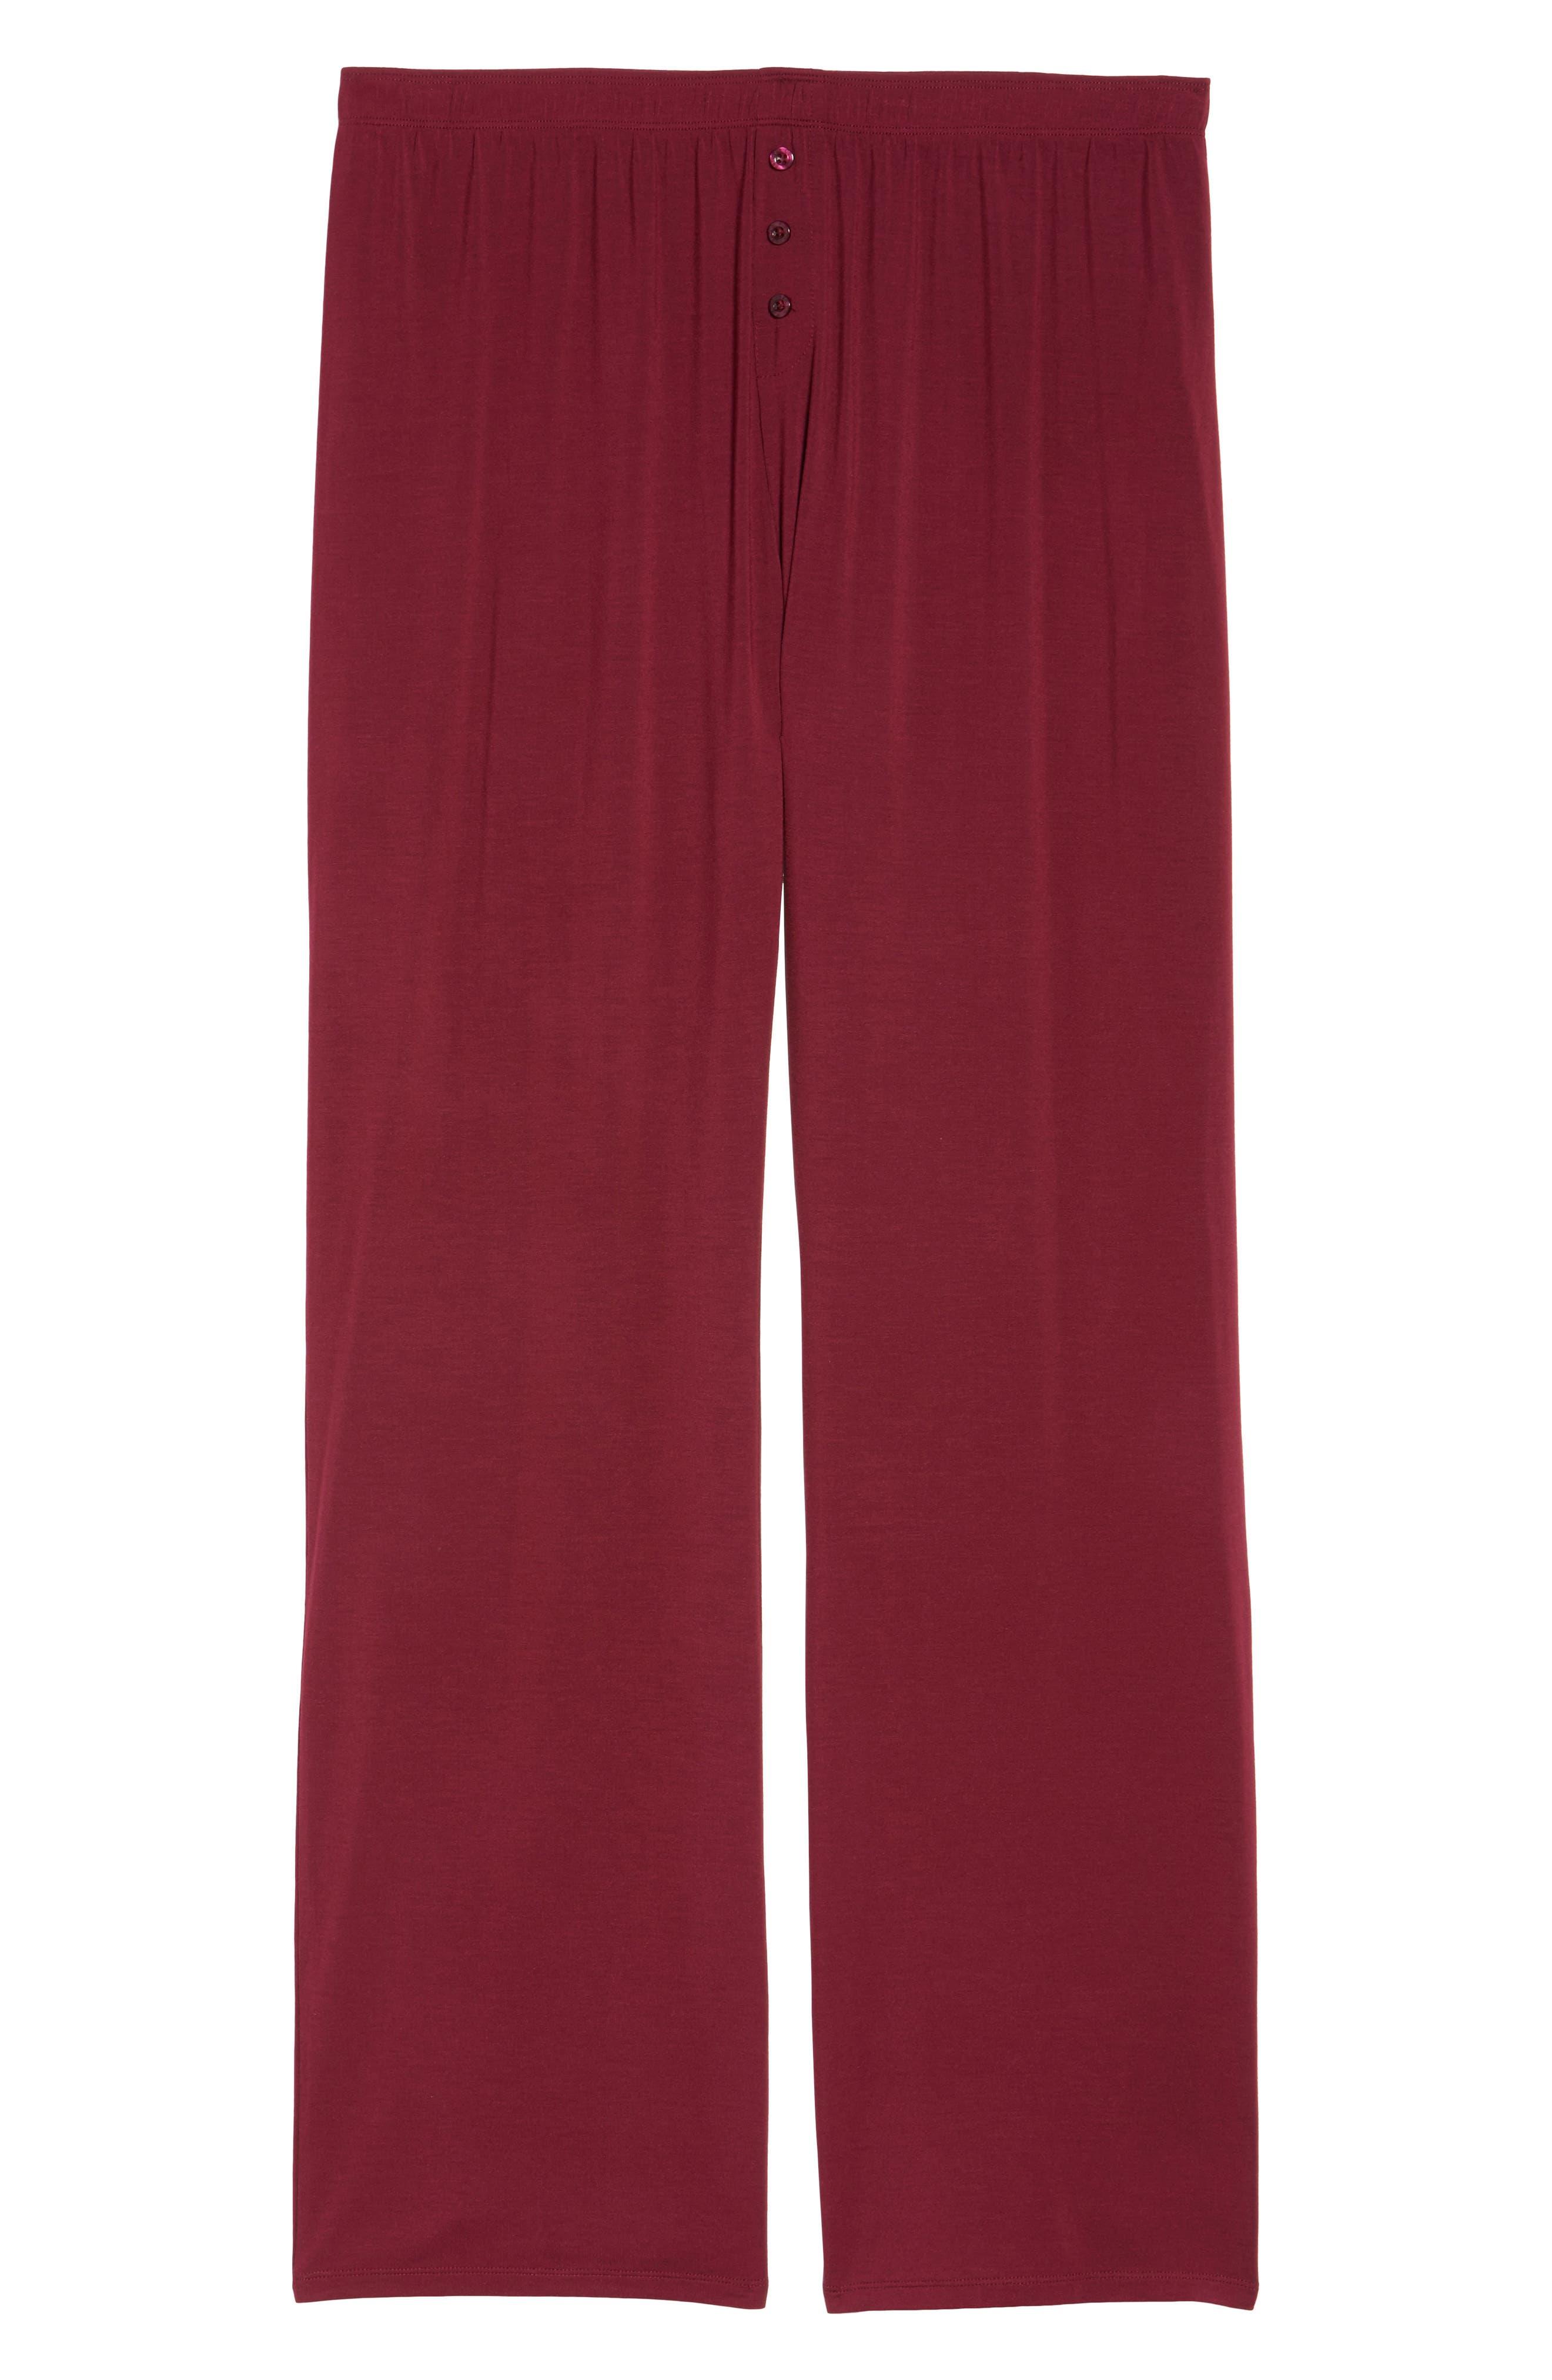 Alternate Image 4  - PJ Salvage Lounge Pants (Plus Size)